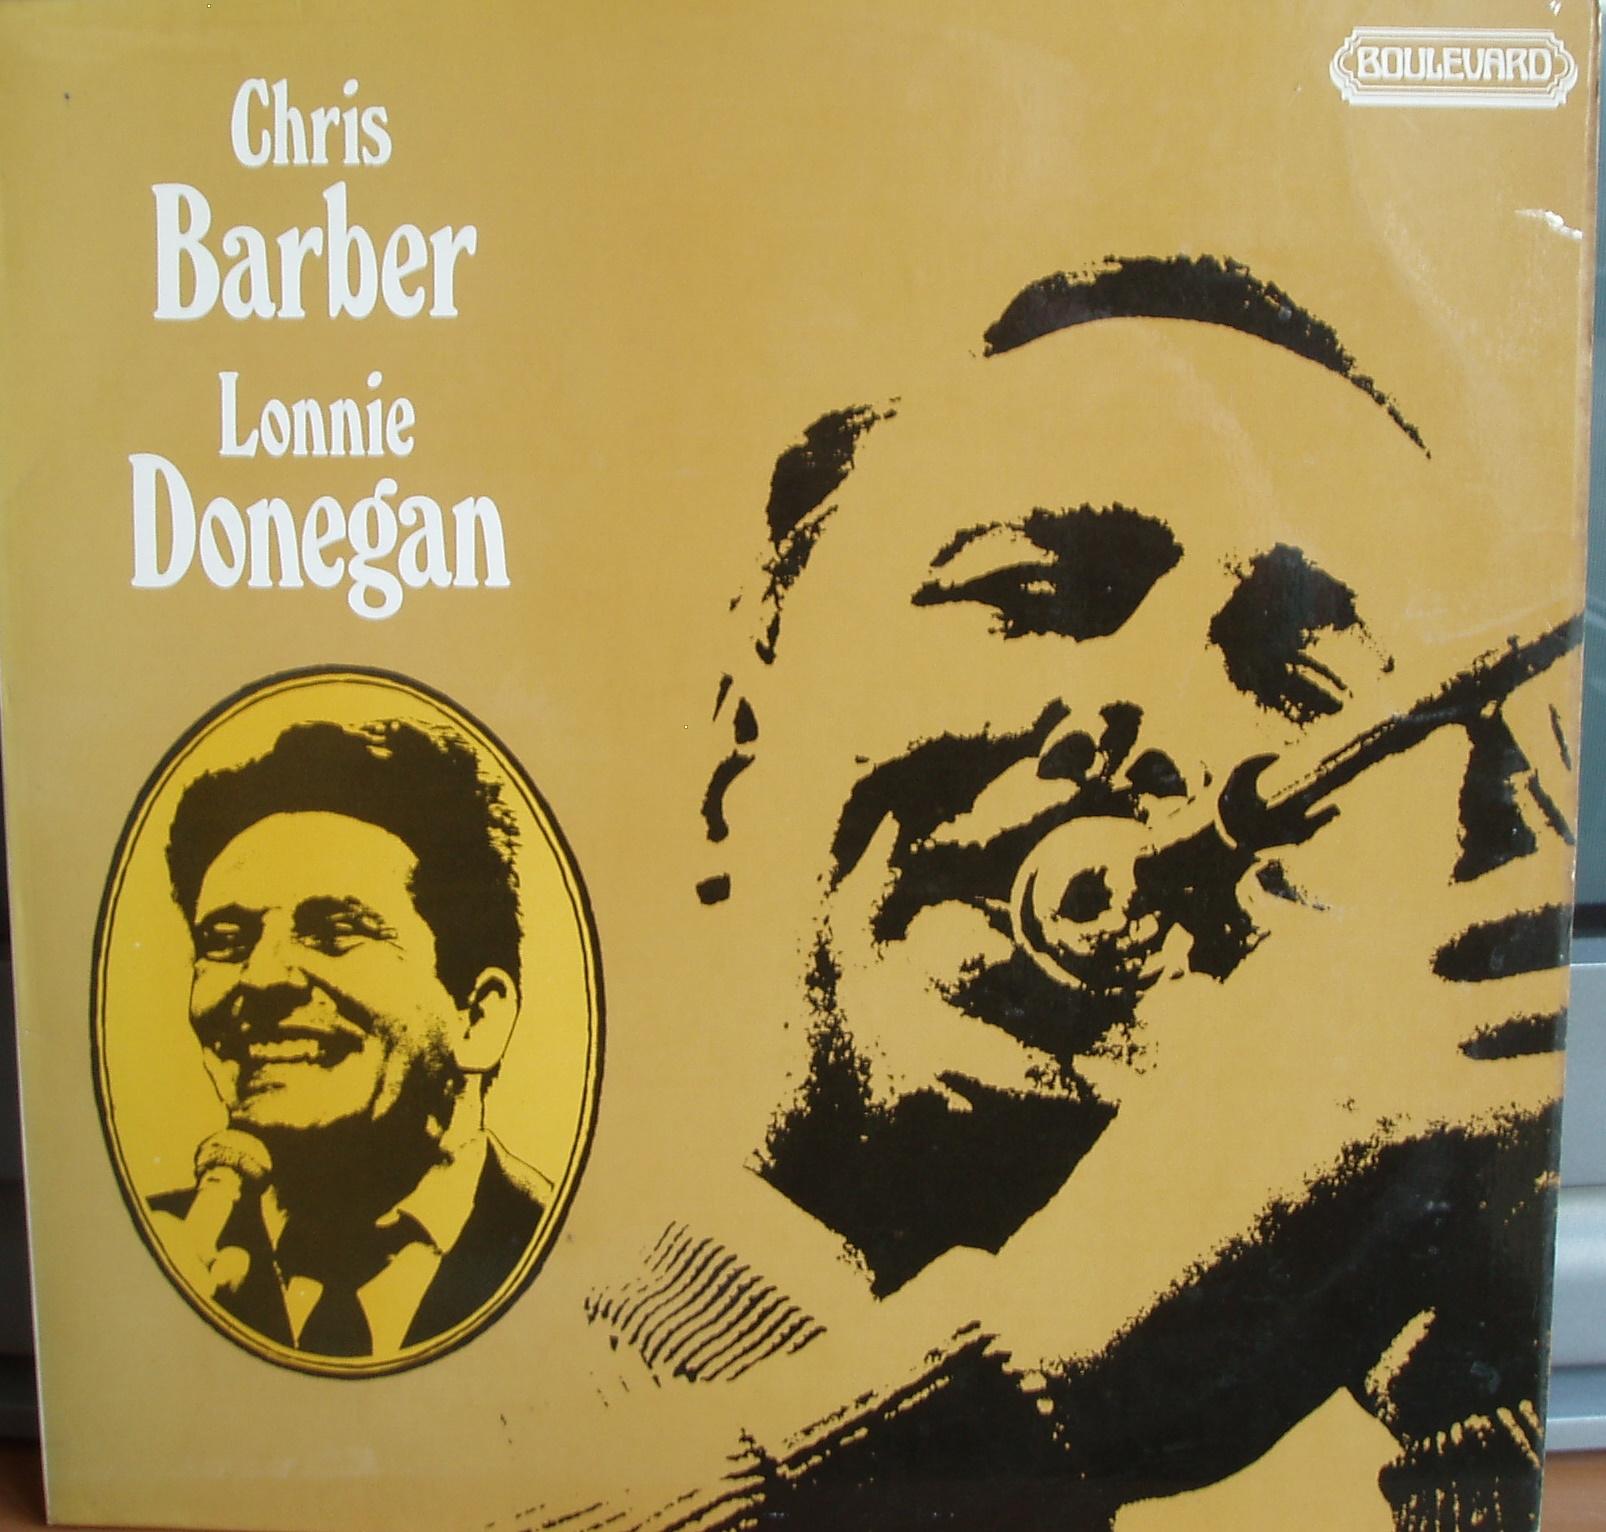 Chris Barber & Lonnie Donegan